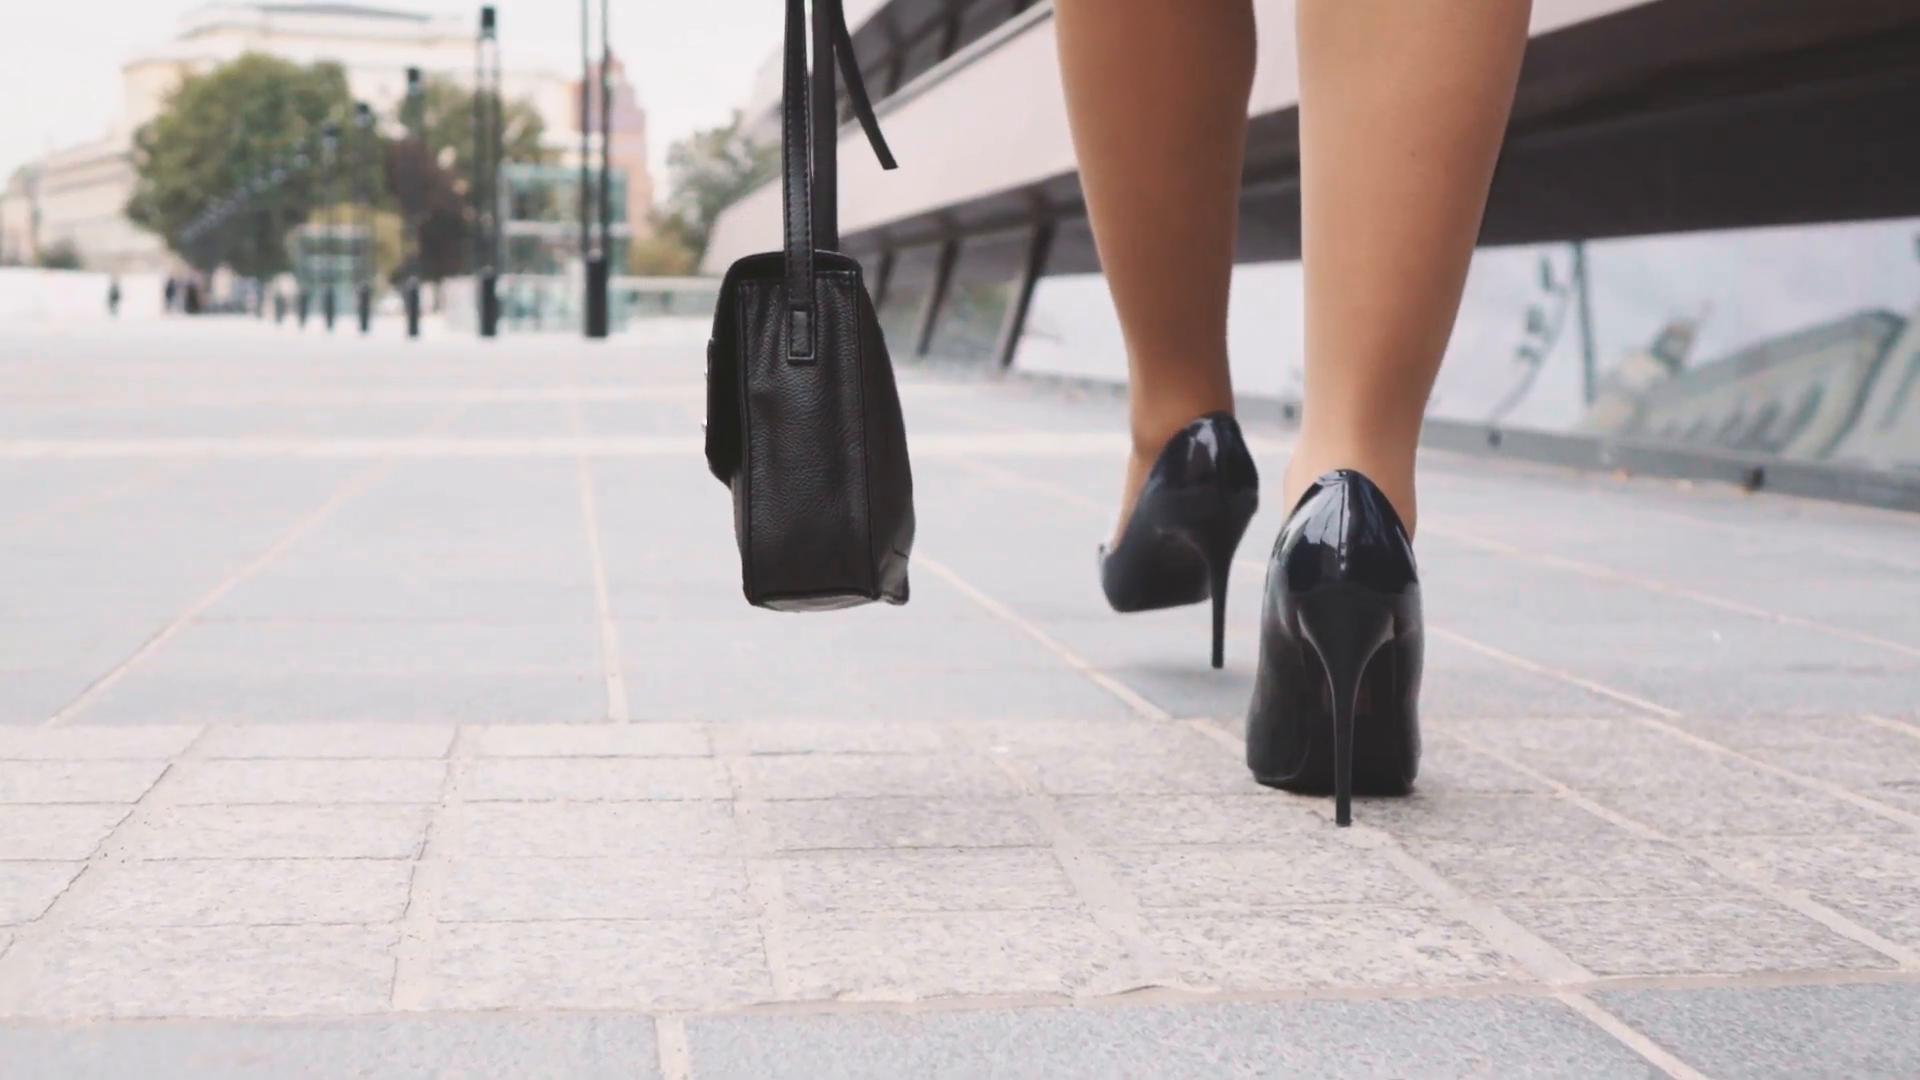 Женщина на каблуках